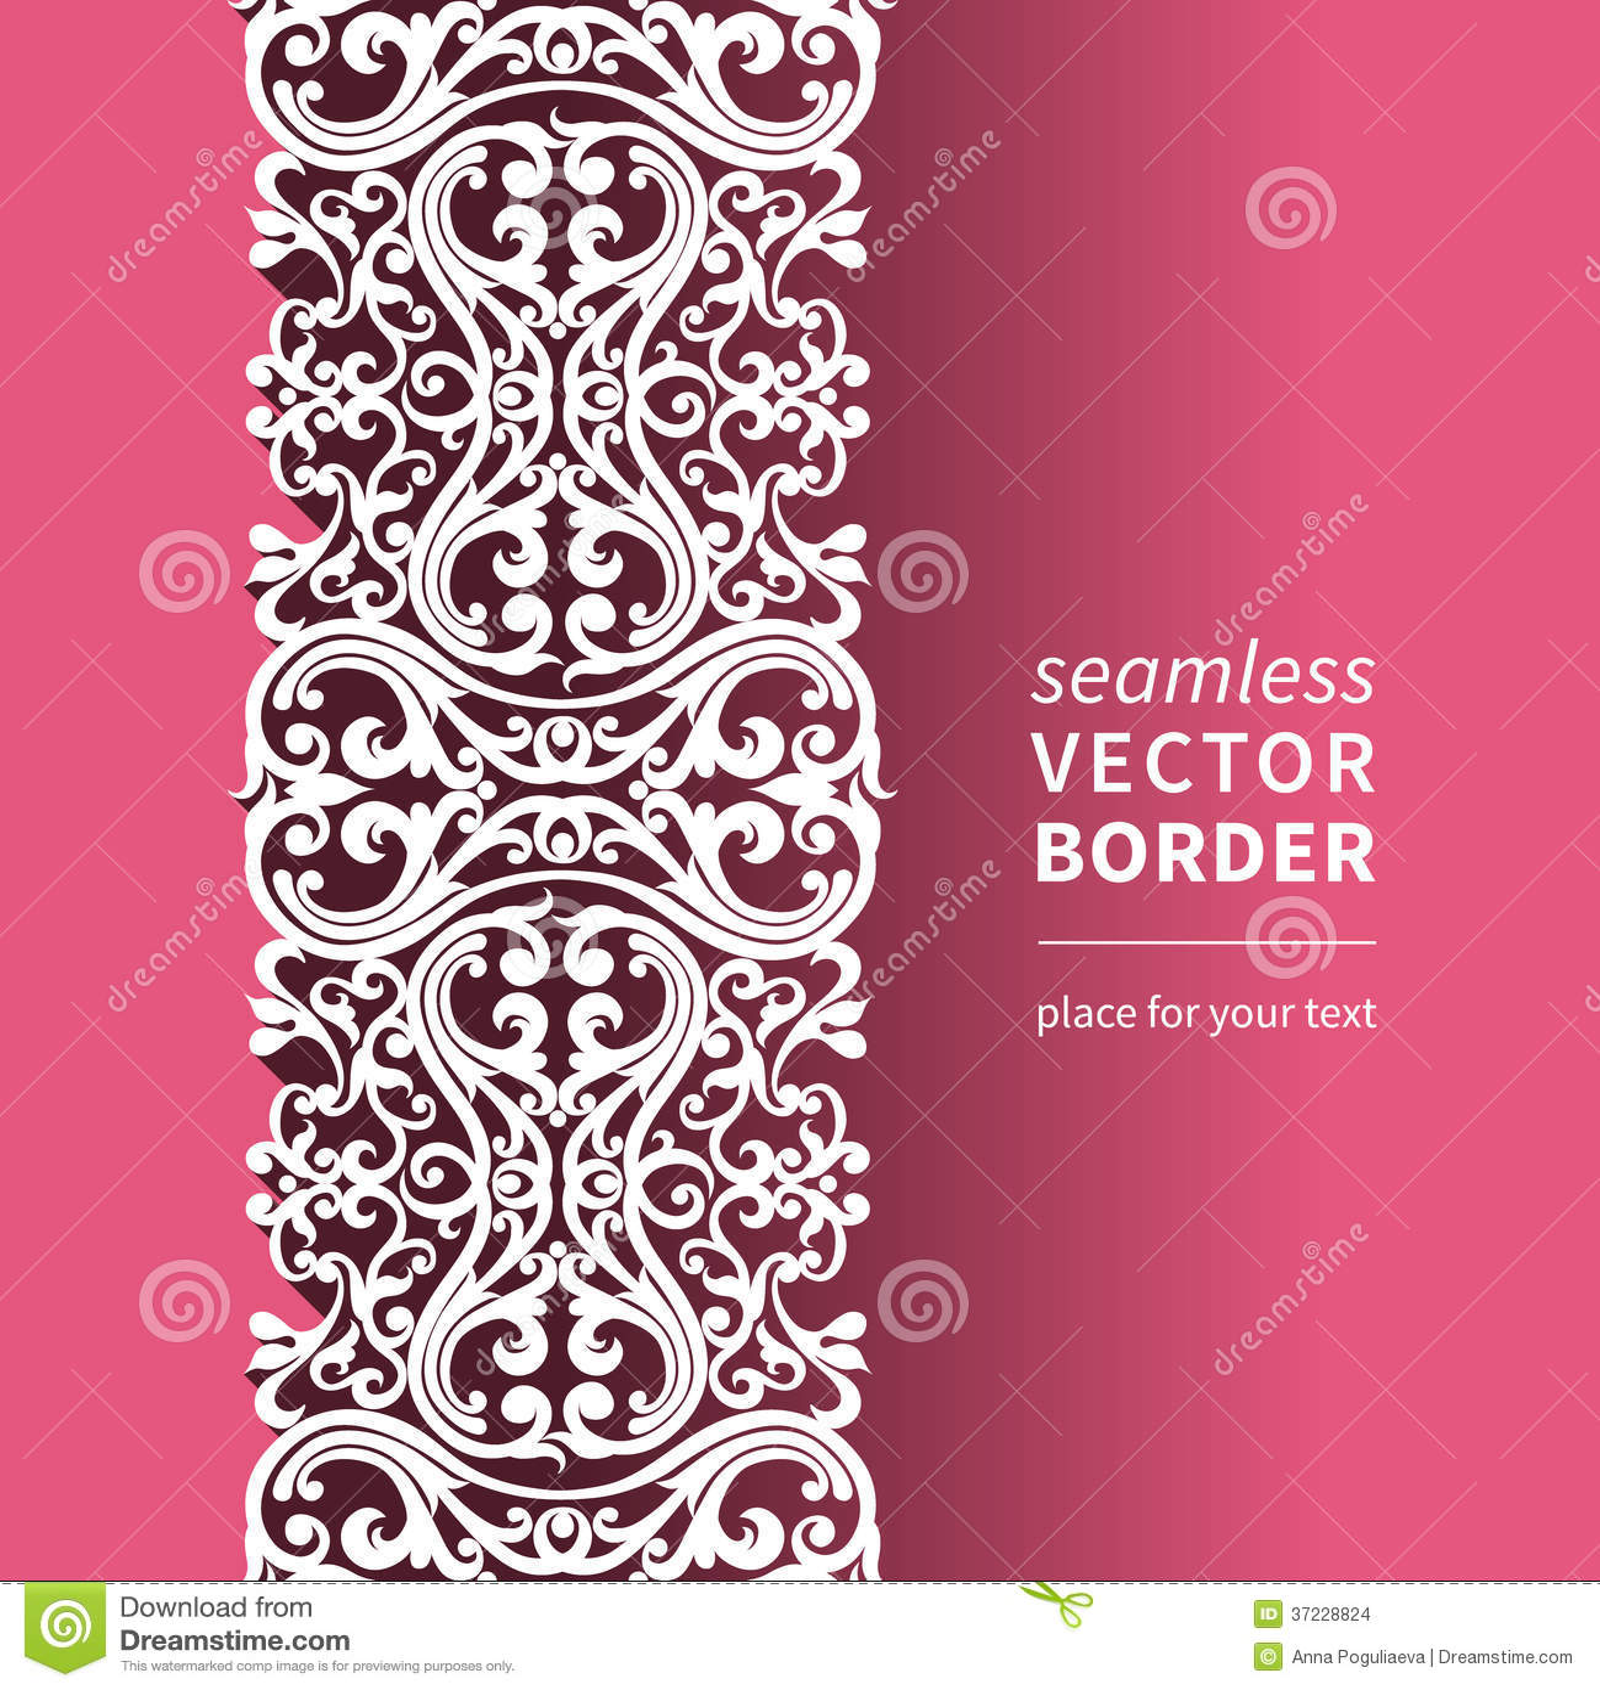 Vector Victorian Ornamental Border In Flat Design Style ...